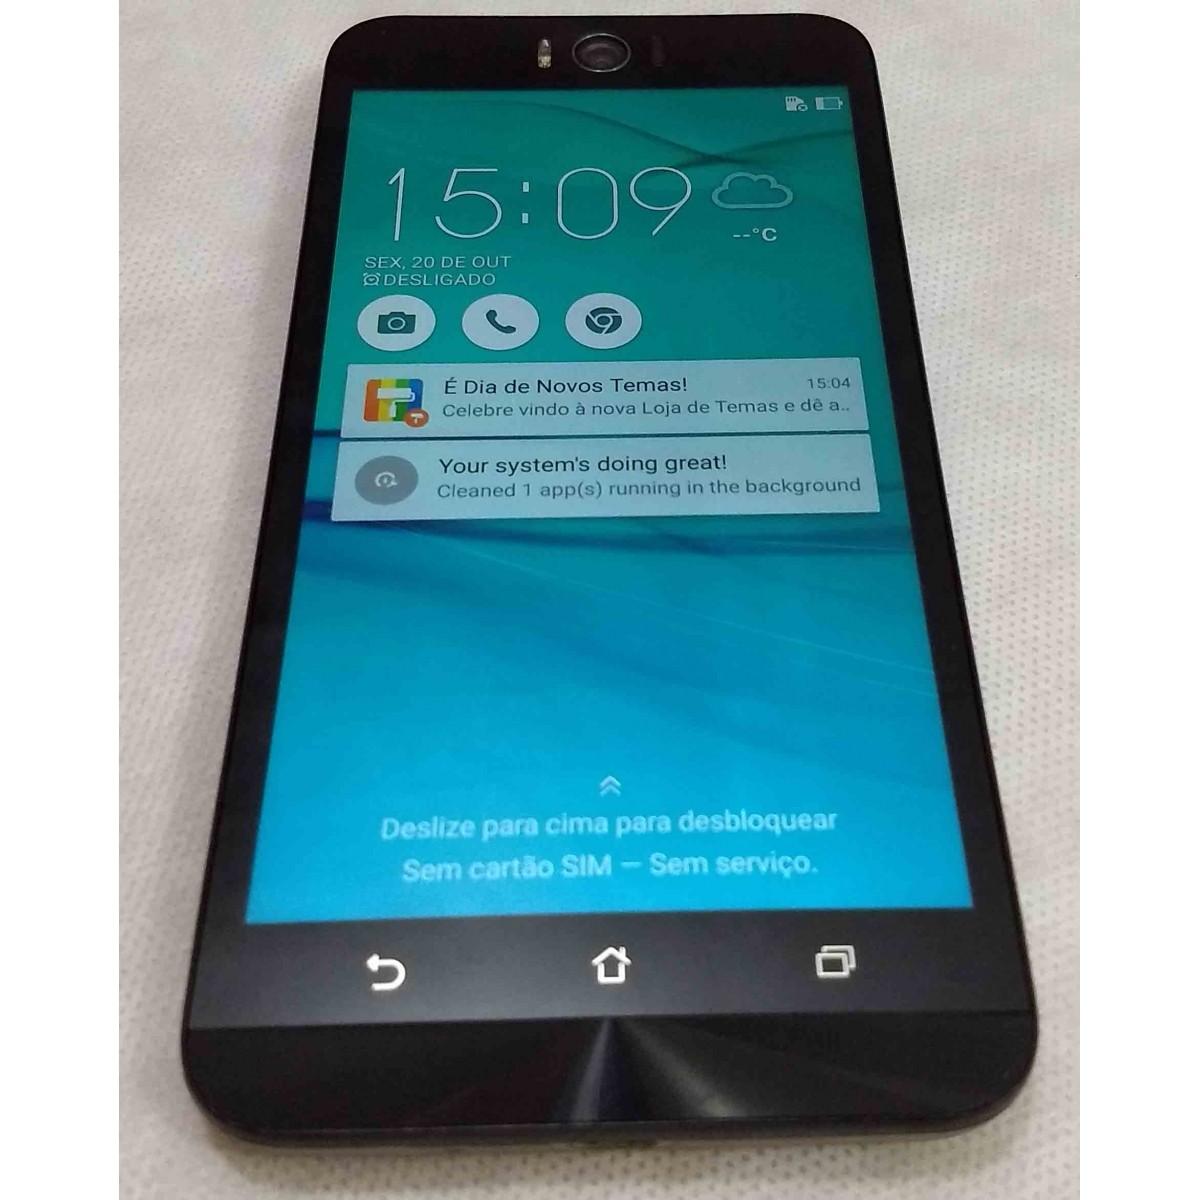 Smartphone Asus Zenfone Selfie 5.5'' 32GB Wifi Bluetooth 4G 13MP